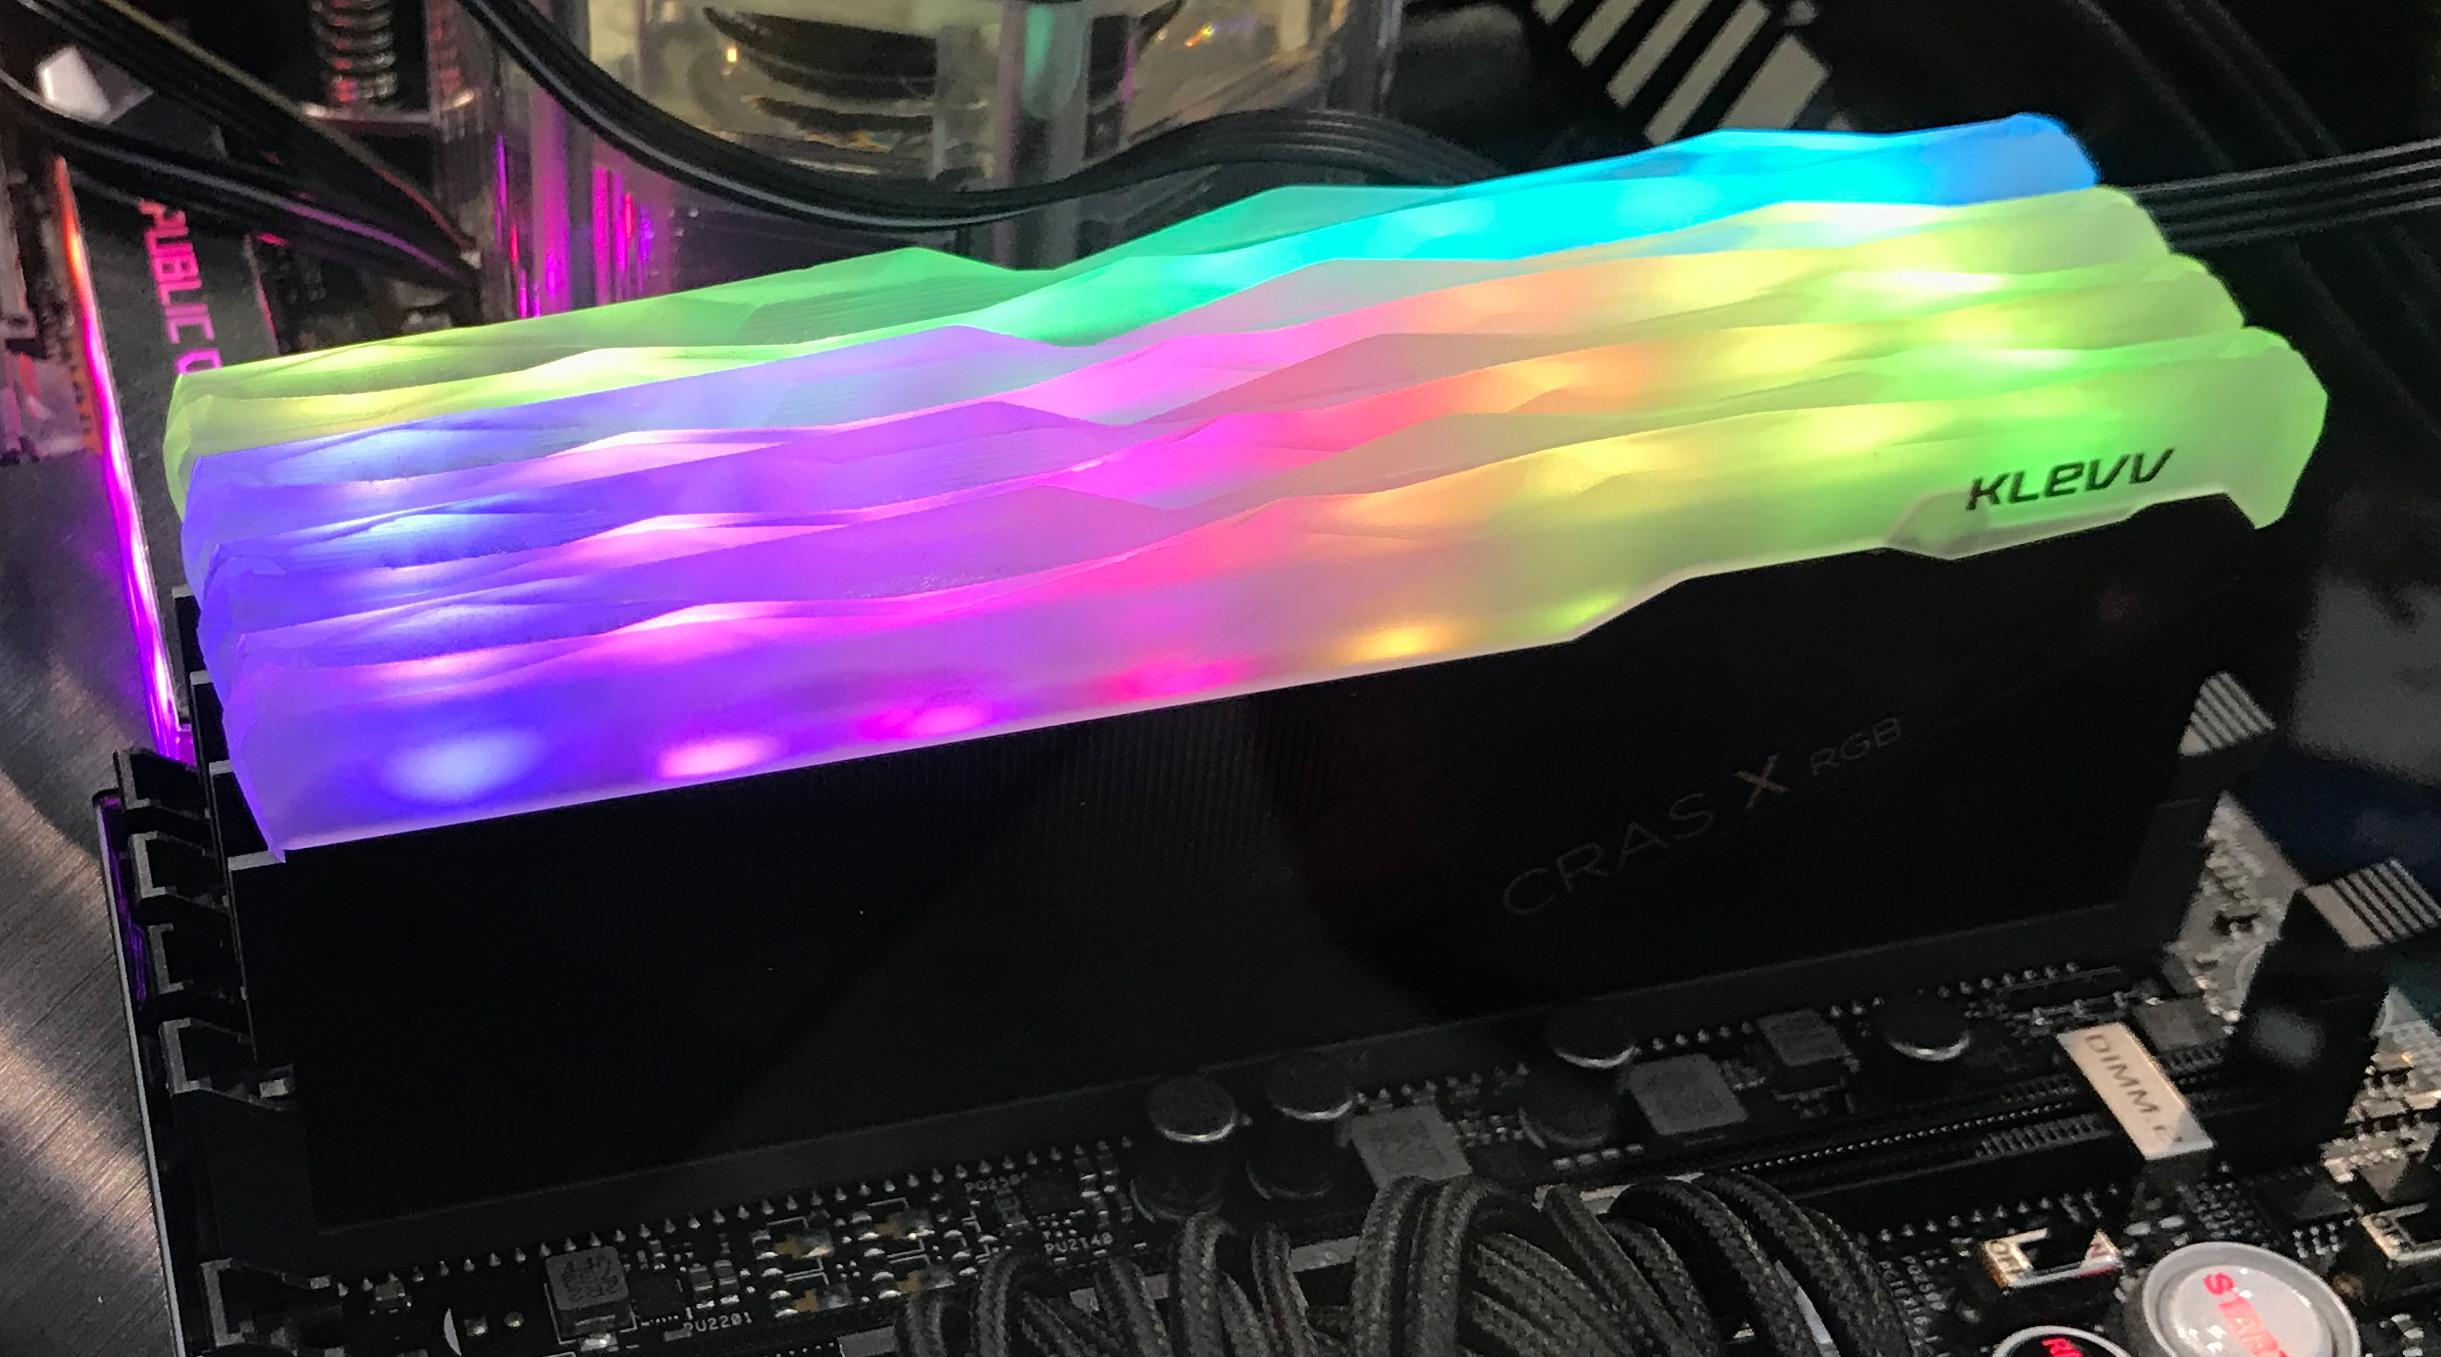 Klevv Adds Kolors: RGB-Lit Enthusiast-Class Cras DIMMs & SSD